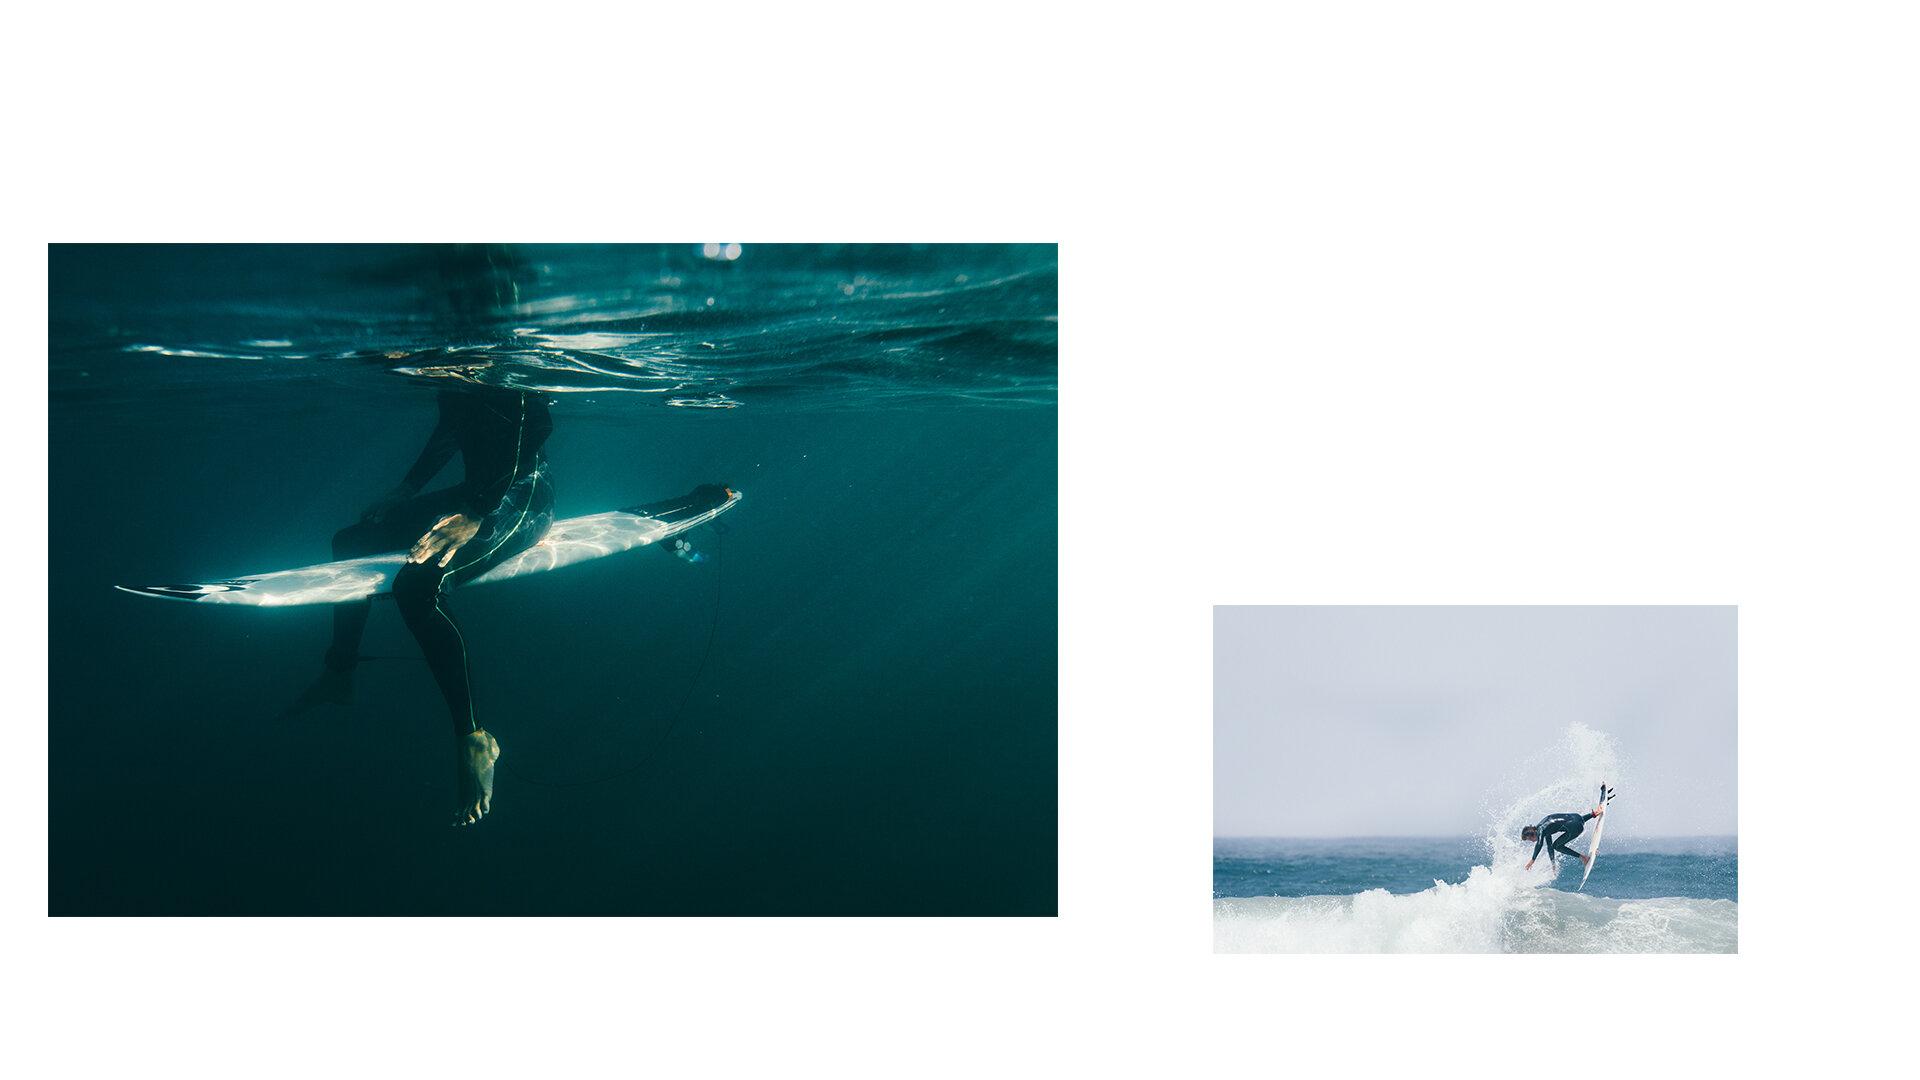 toby-butler-tobybutlerphoto-surf-surfing-waterphotography-ocean-Oneill-wetsuits-swimwear-girl-bikini-clothing-surf-portugal-lifestylephotography-1.jpg